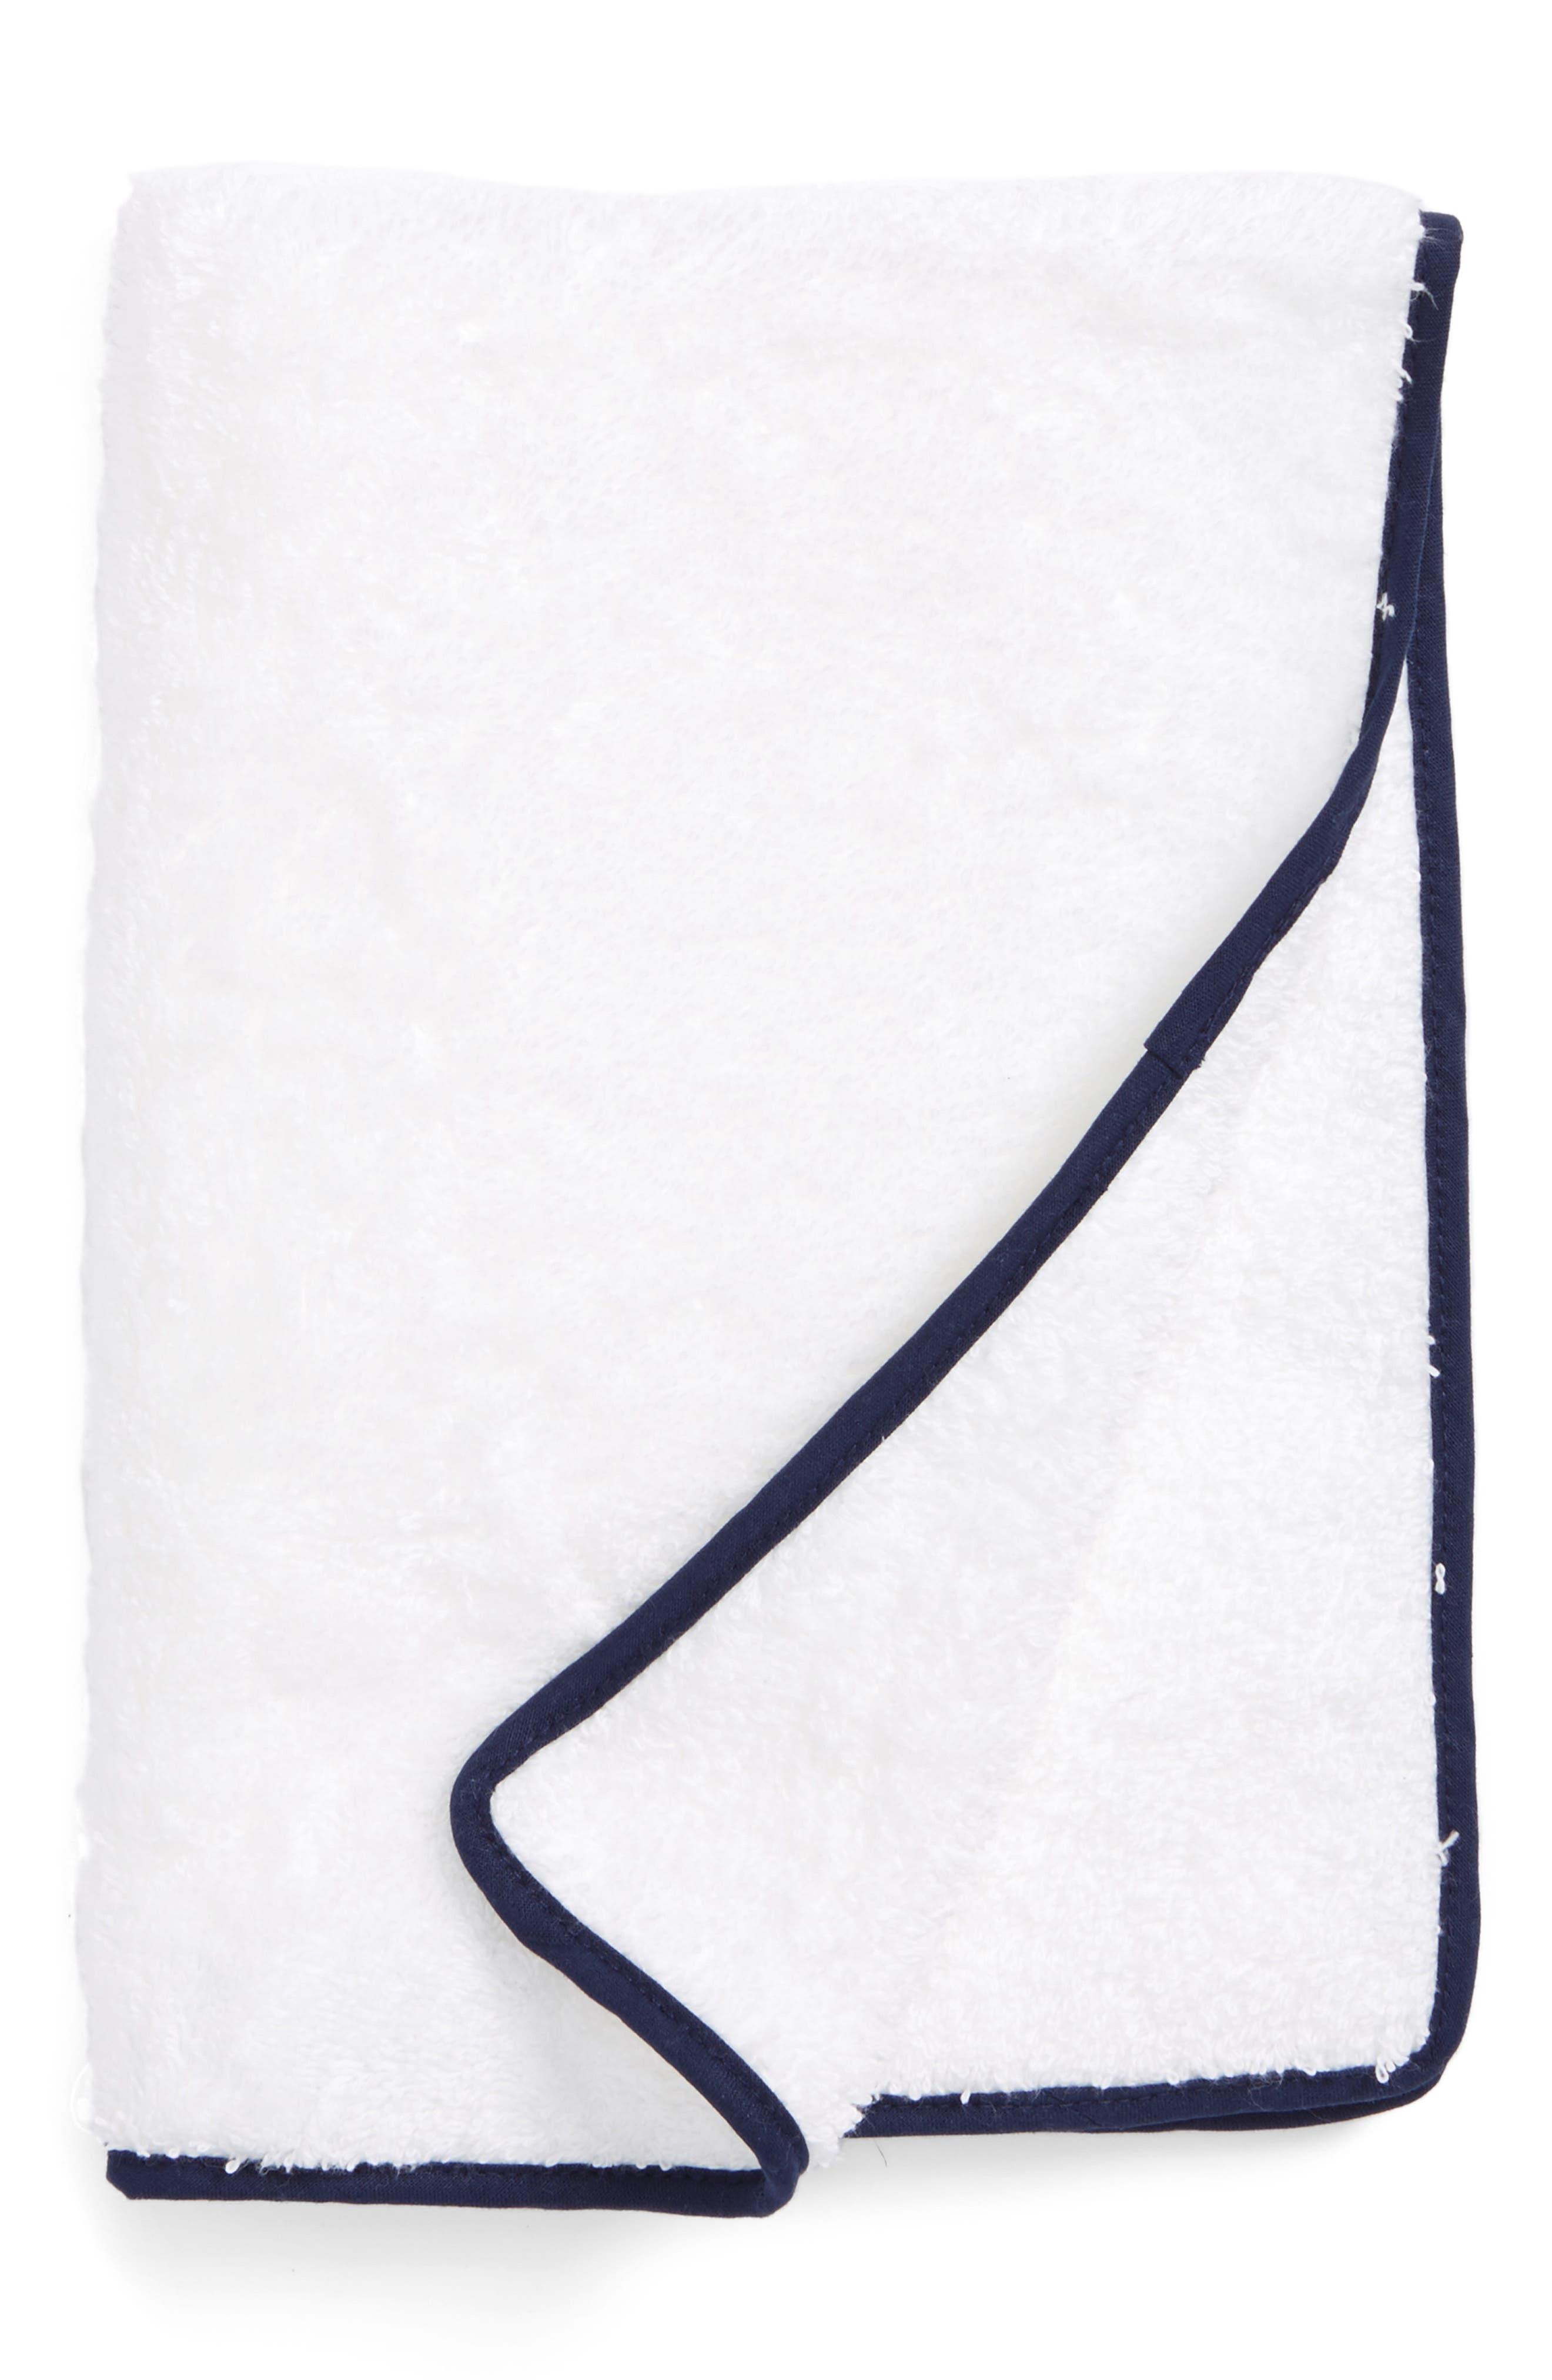 Main Image - Matouk Cairo Guest Towel